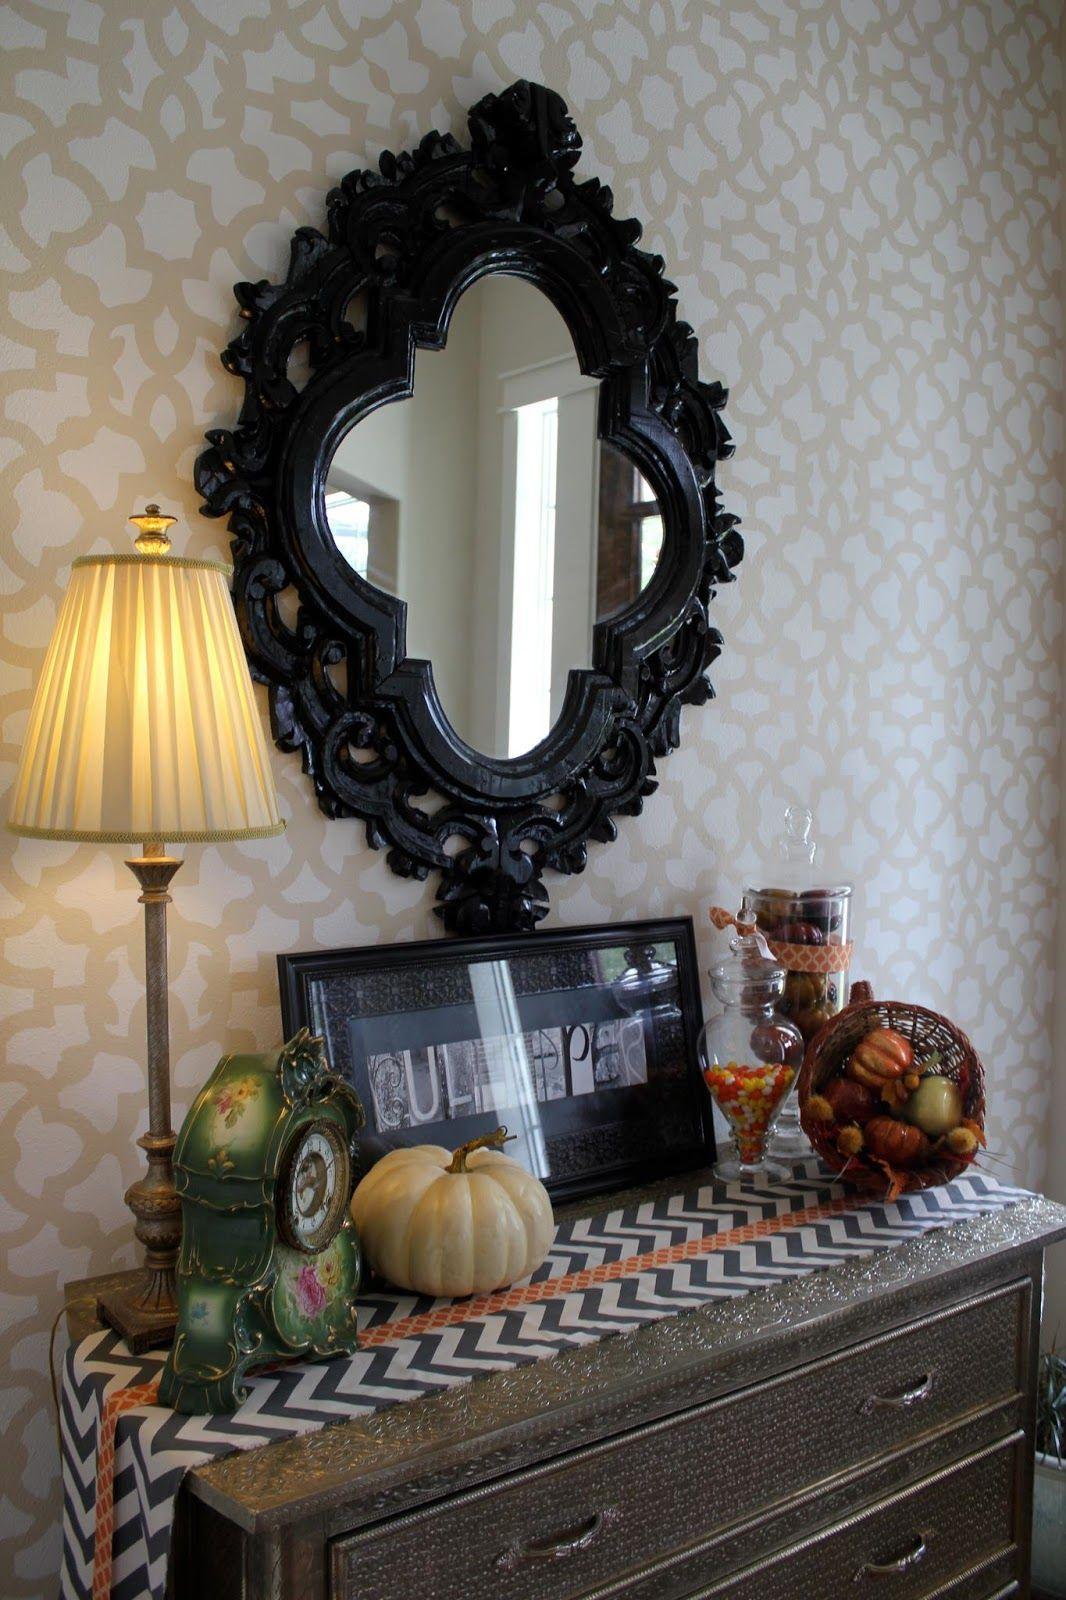 Junk Drawer Chic Home decor, Fall decor, Diy halloween